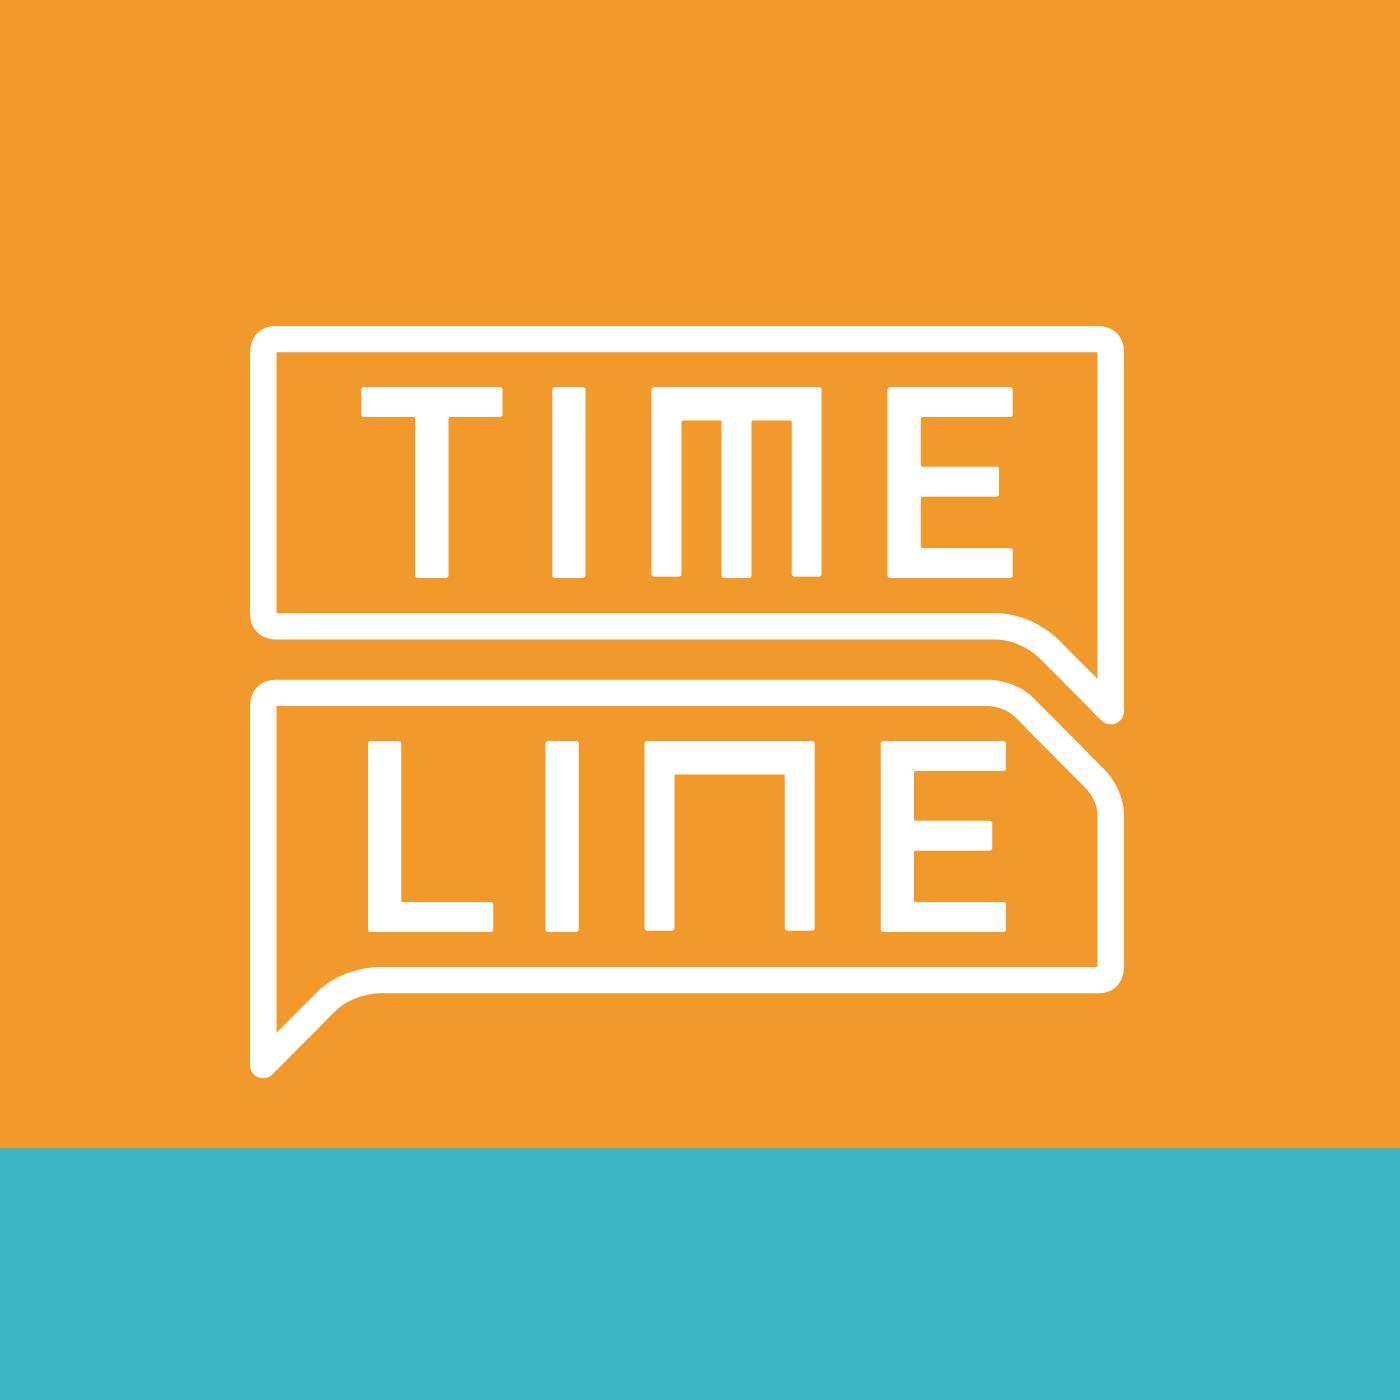 Timeline Gaúcha 20/07/2017